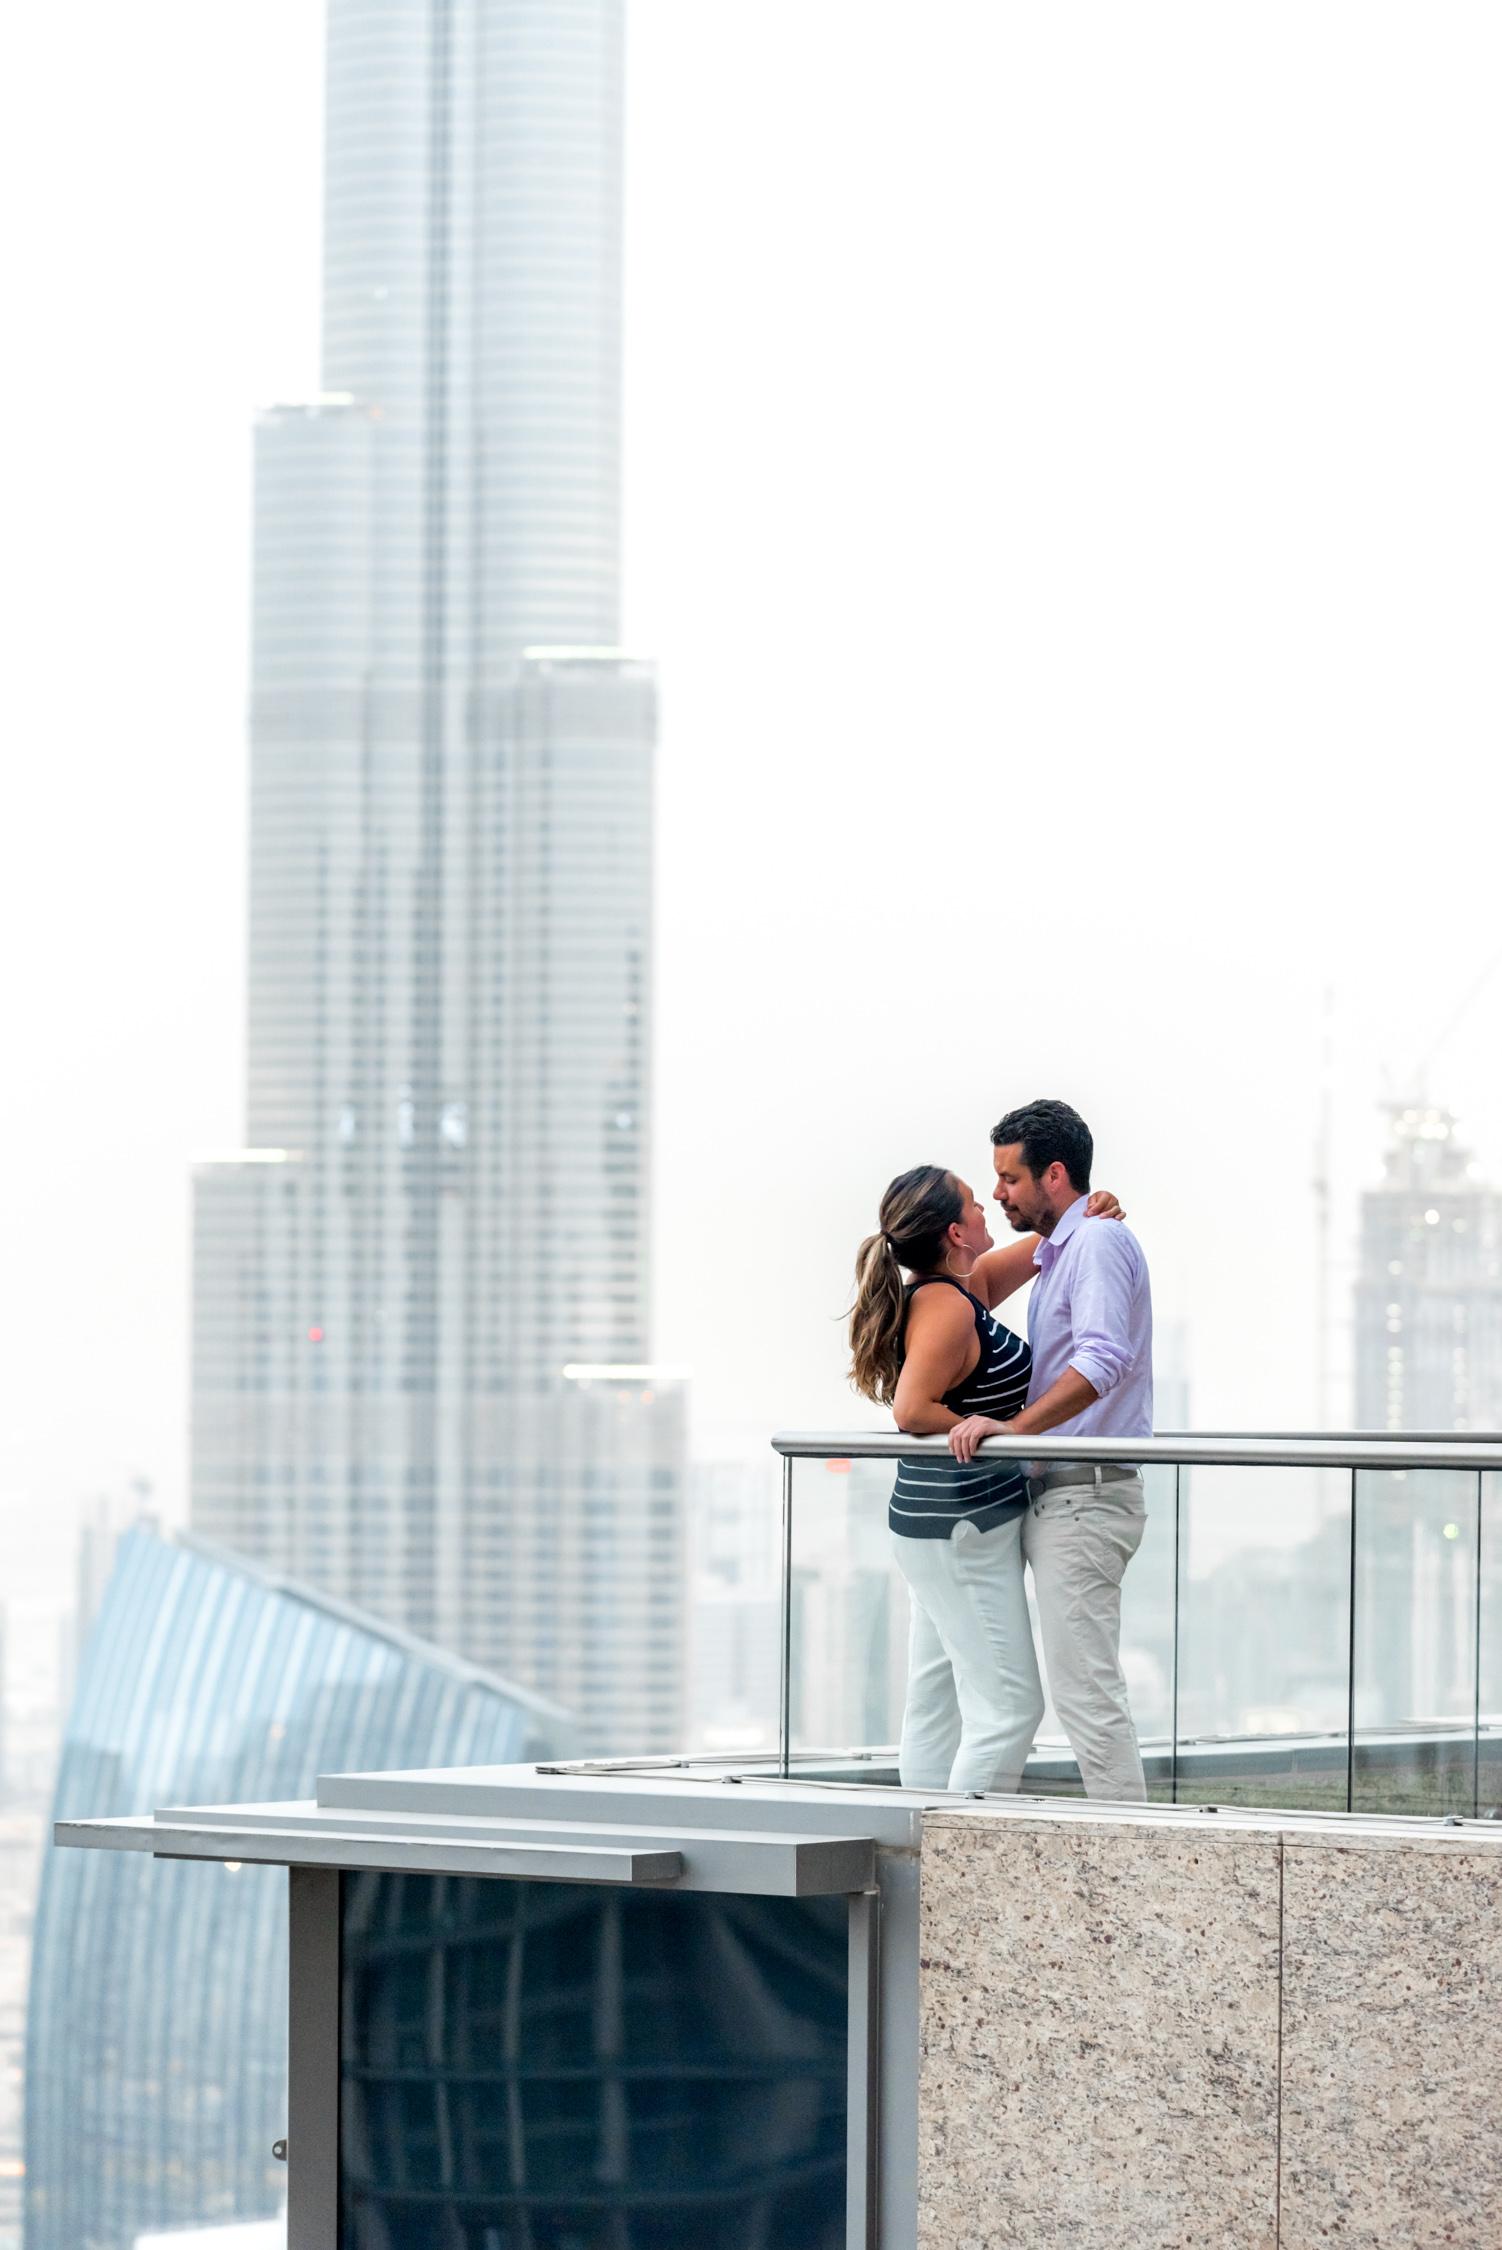 Dubai-423-20180512.jpg